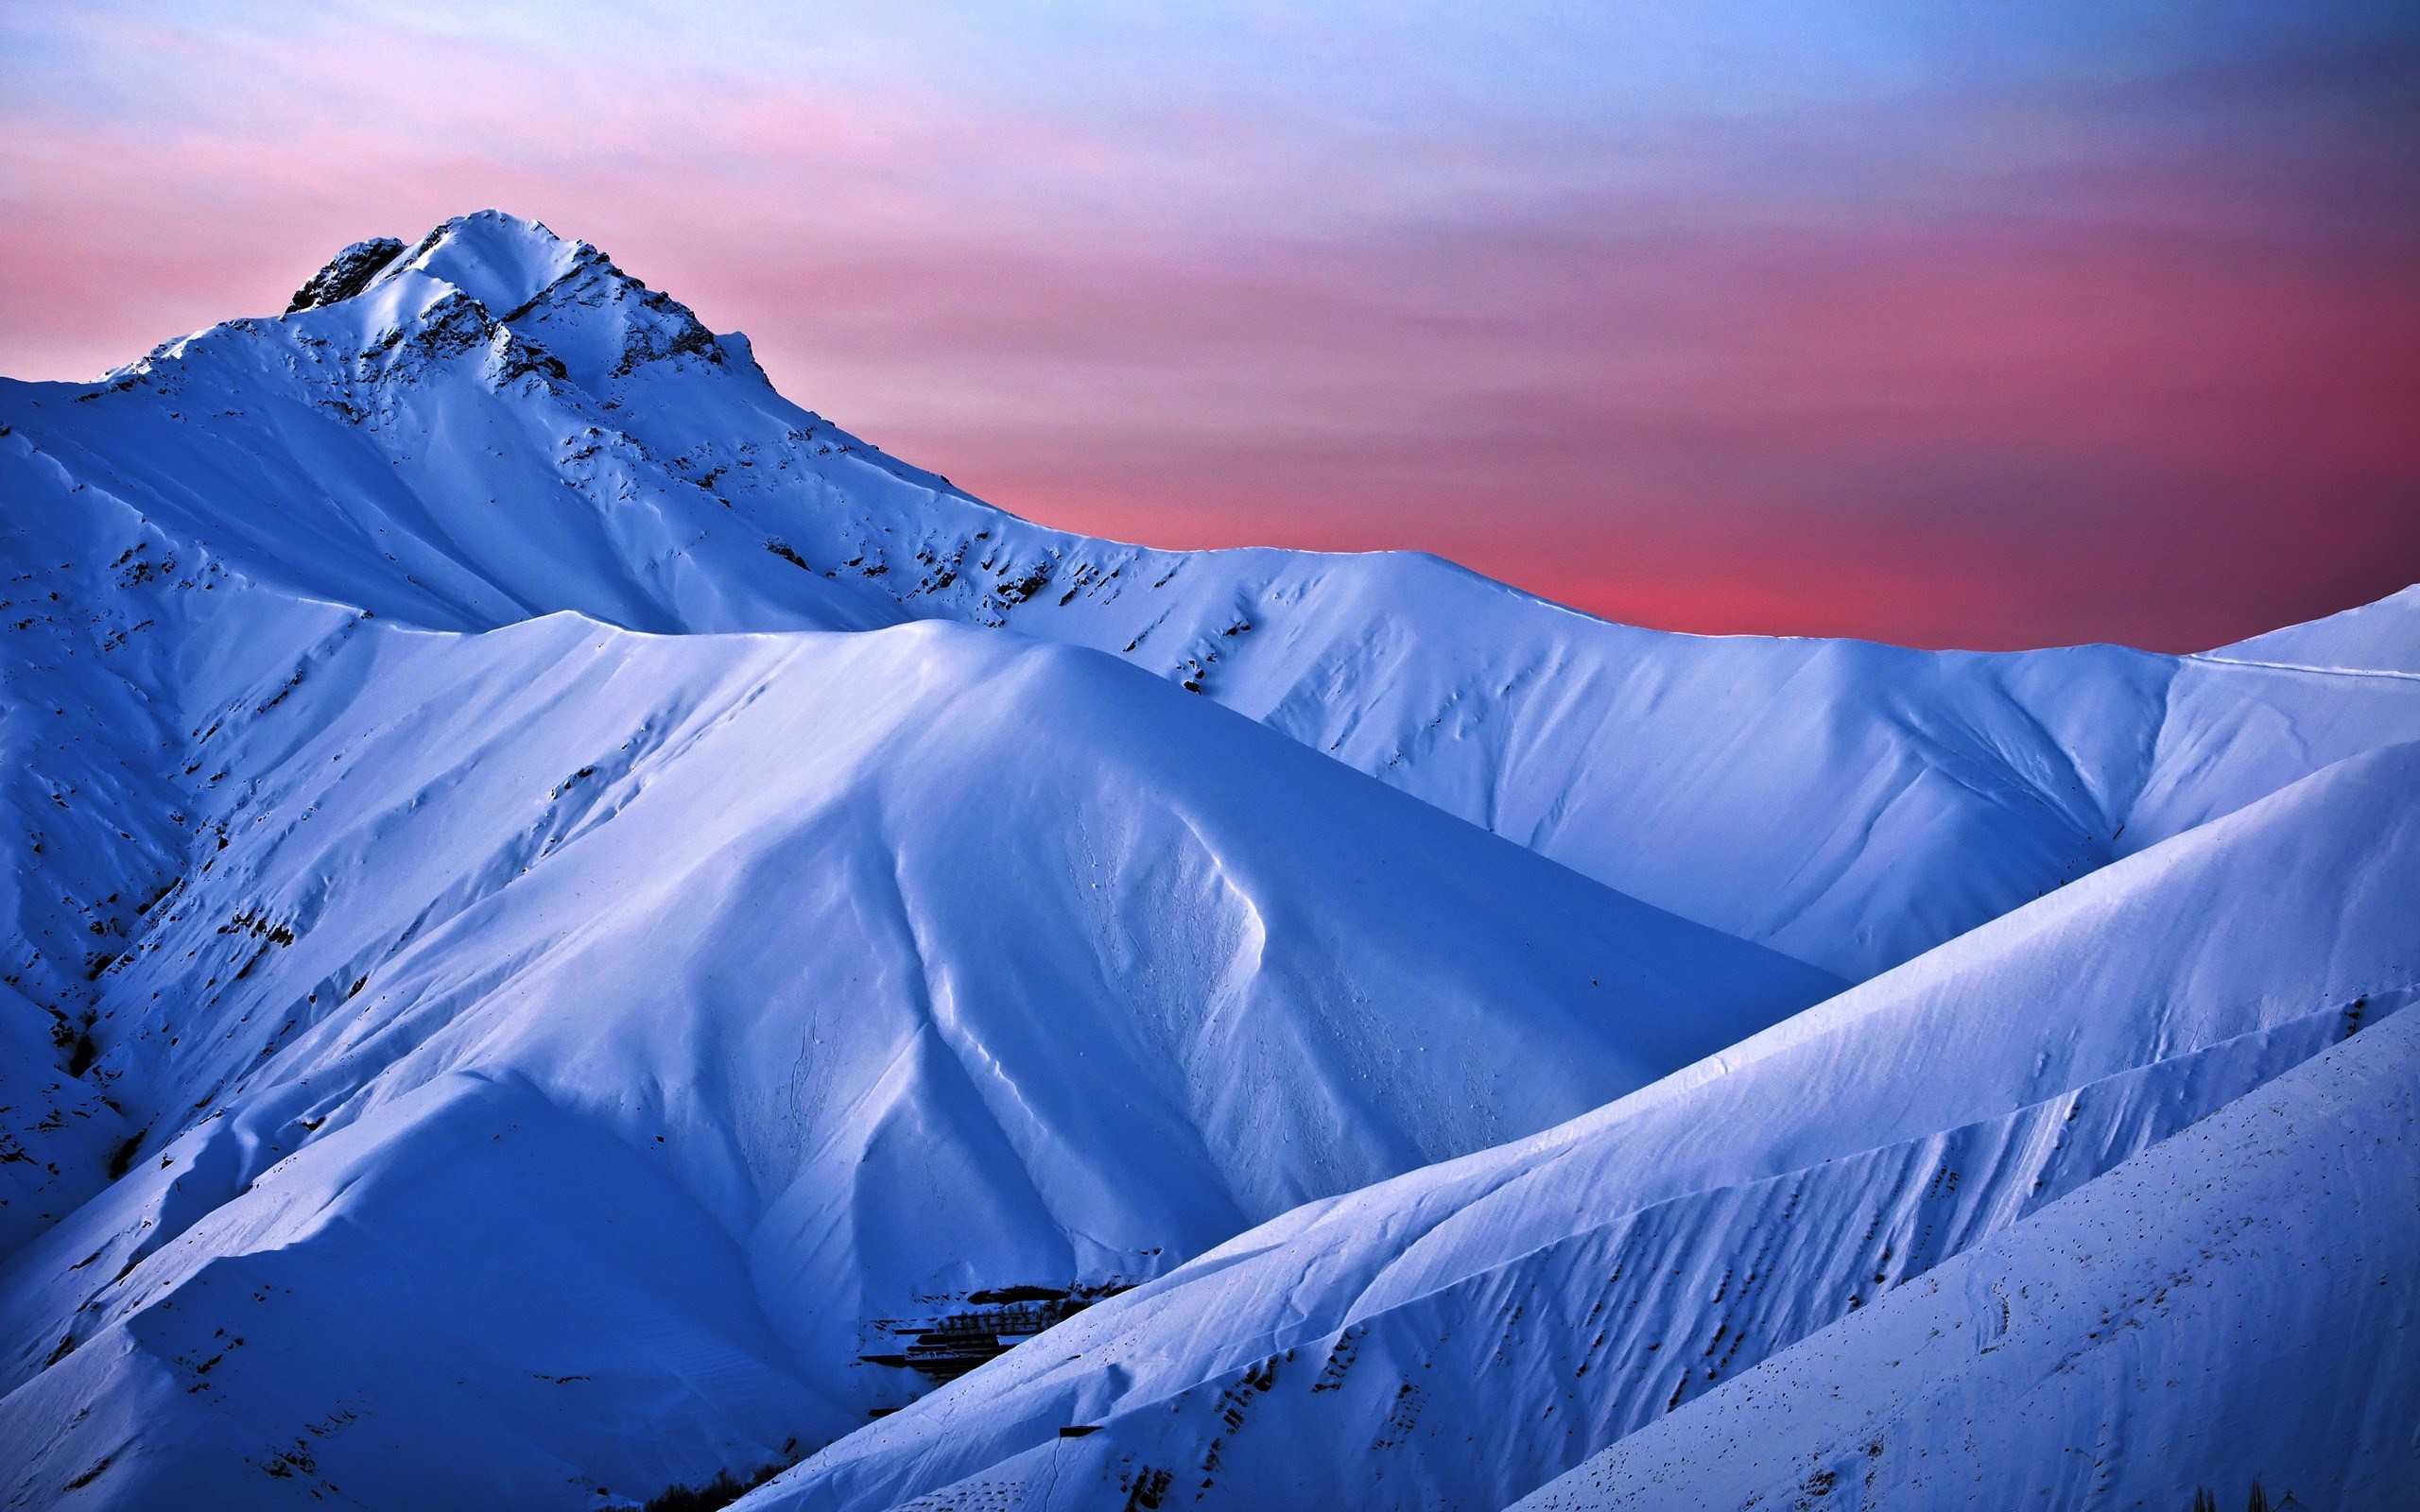 mountain wallpaper. snowy mountain wallpaper mountain wallpaper